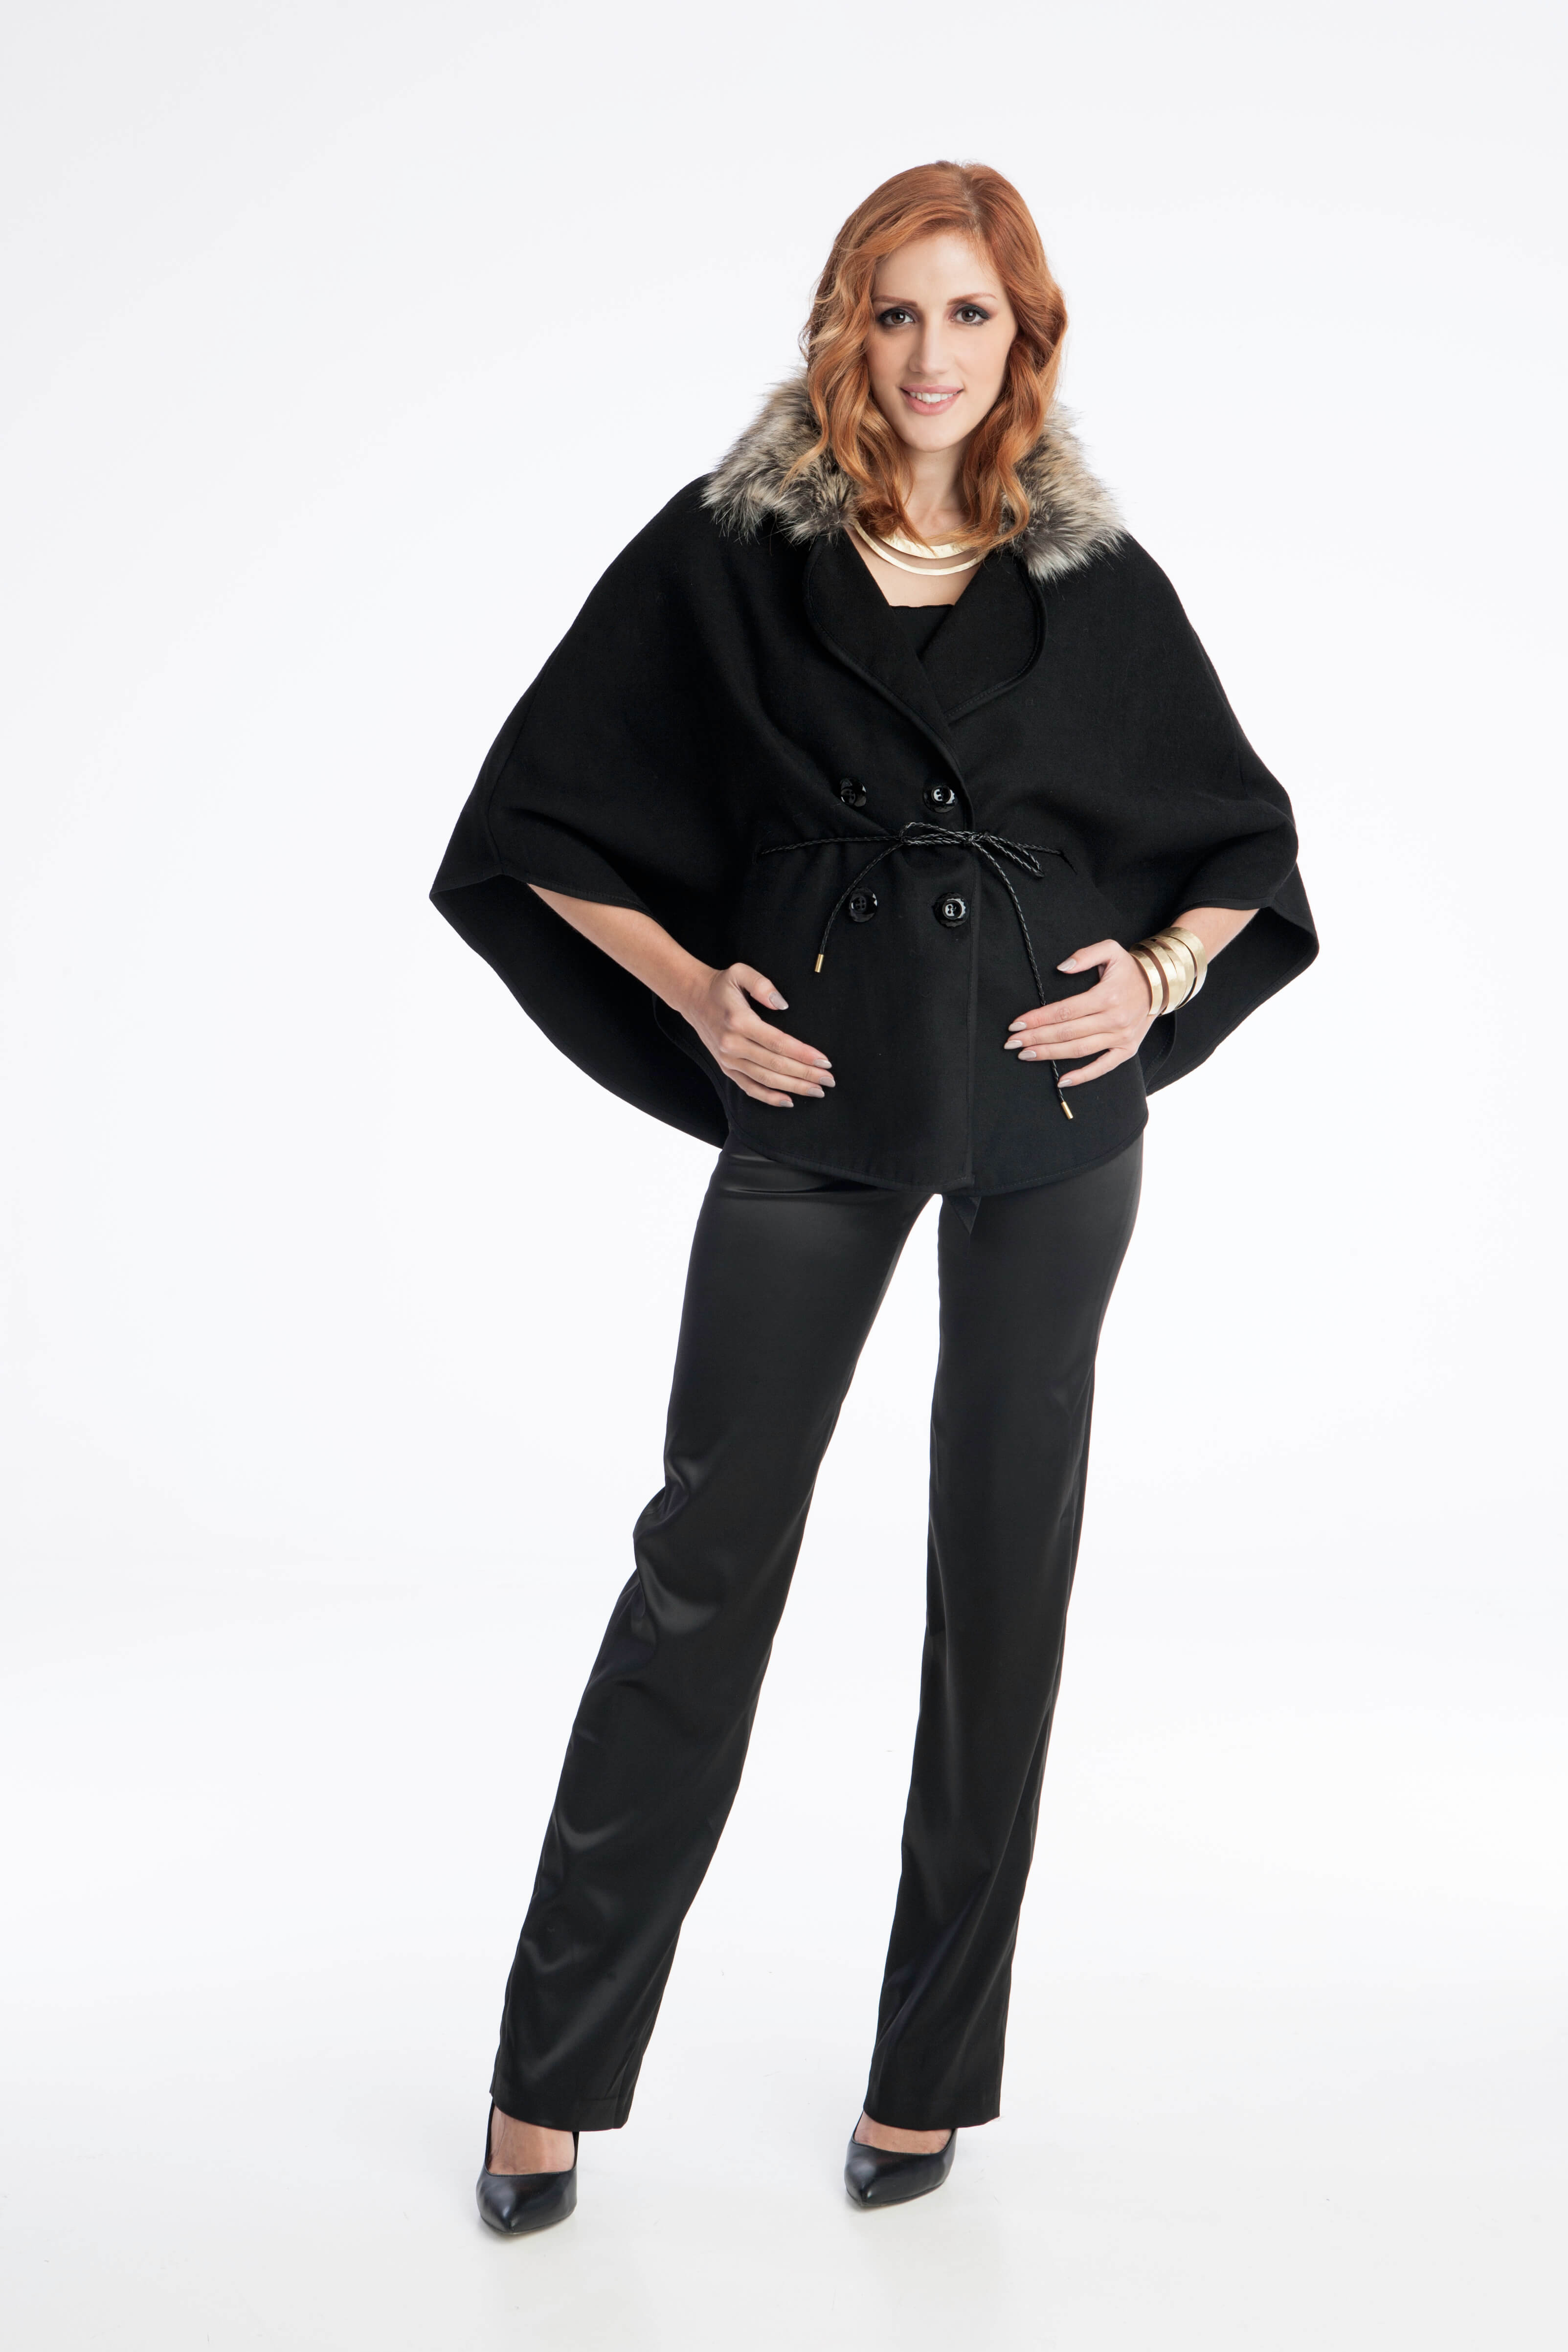 19fca922de95 Γυναικεία κάπα με γούνα - Prestige Fashion